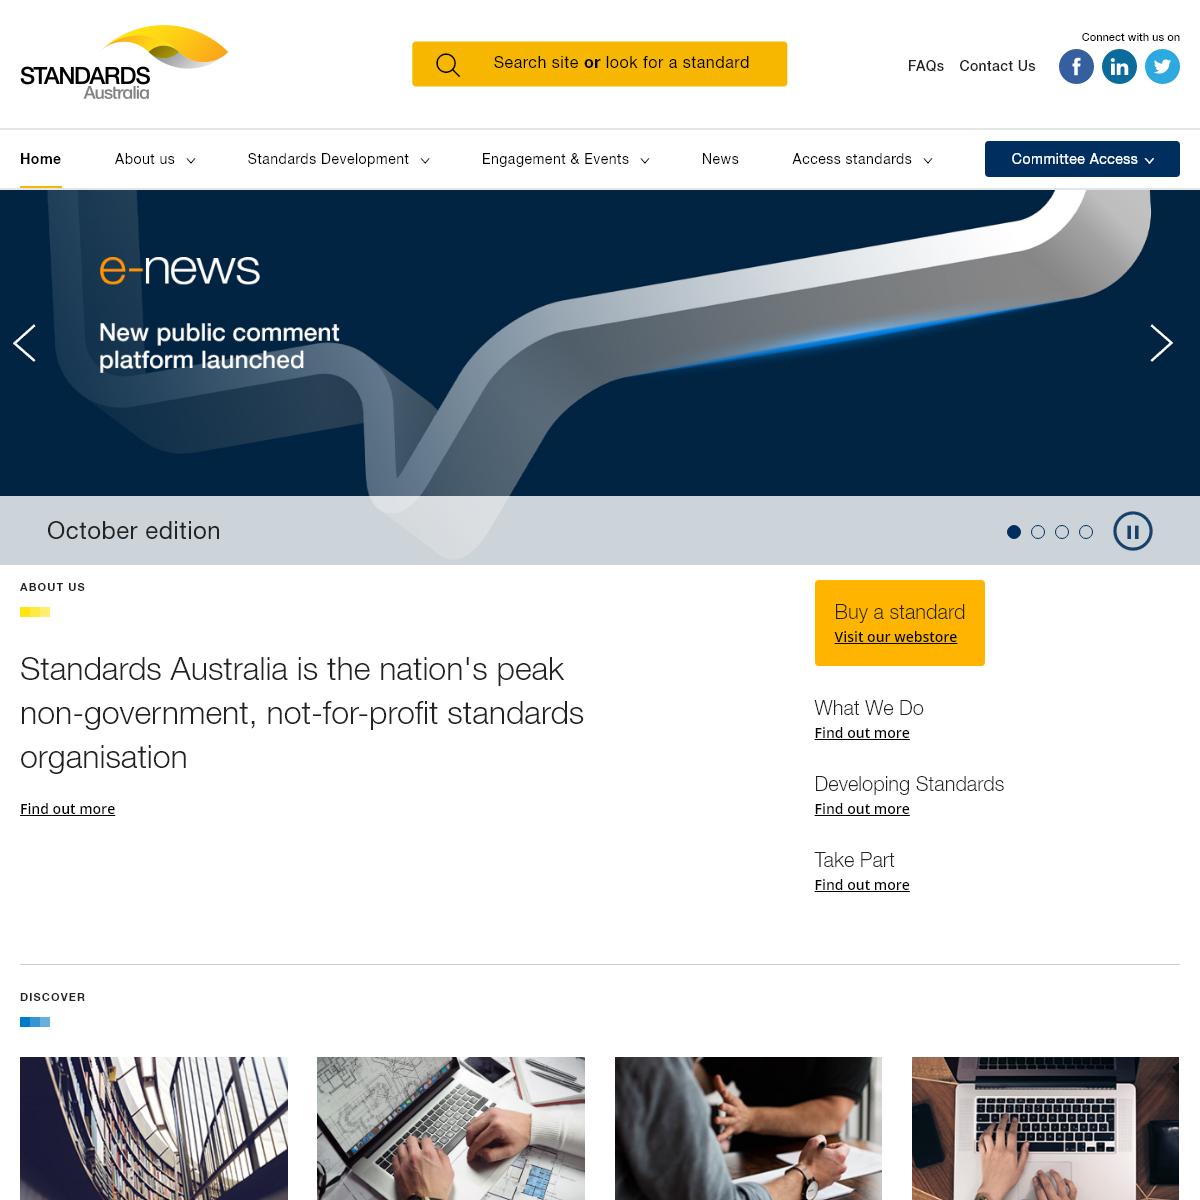 Standards Australia - Standard Organisation in Australia